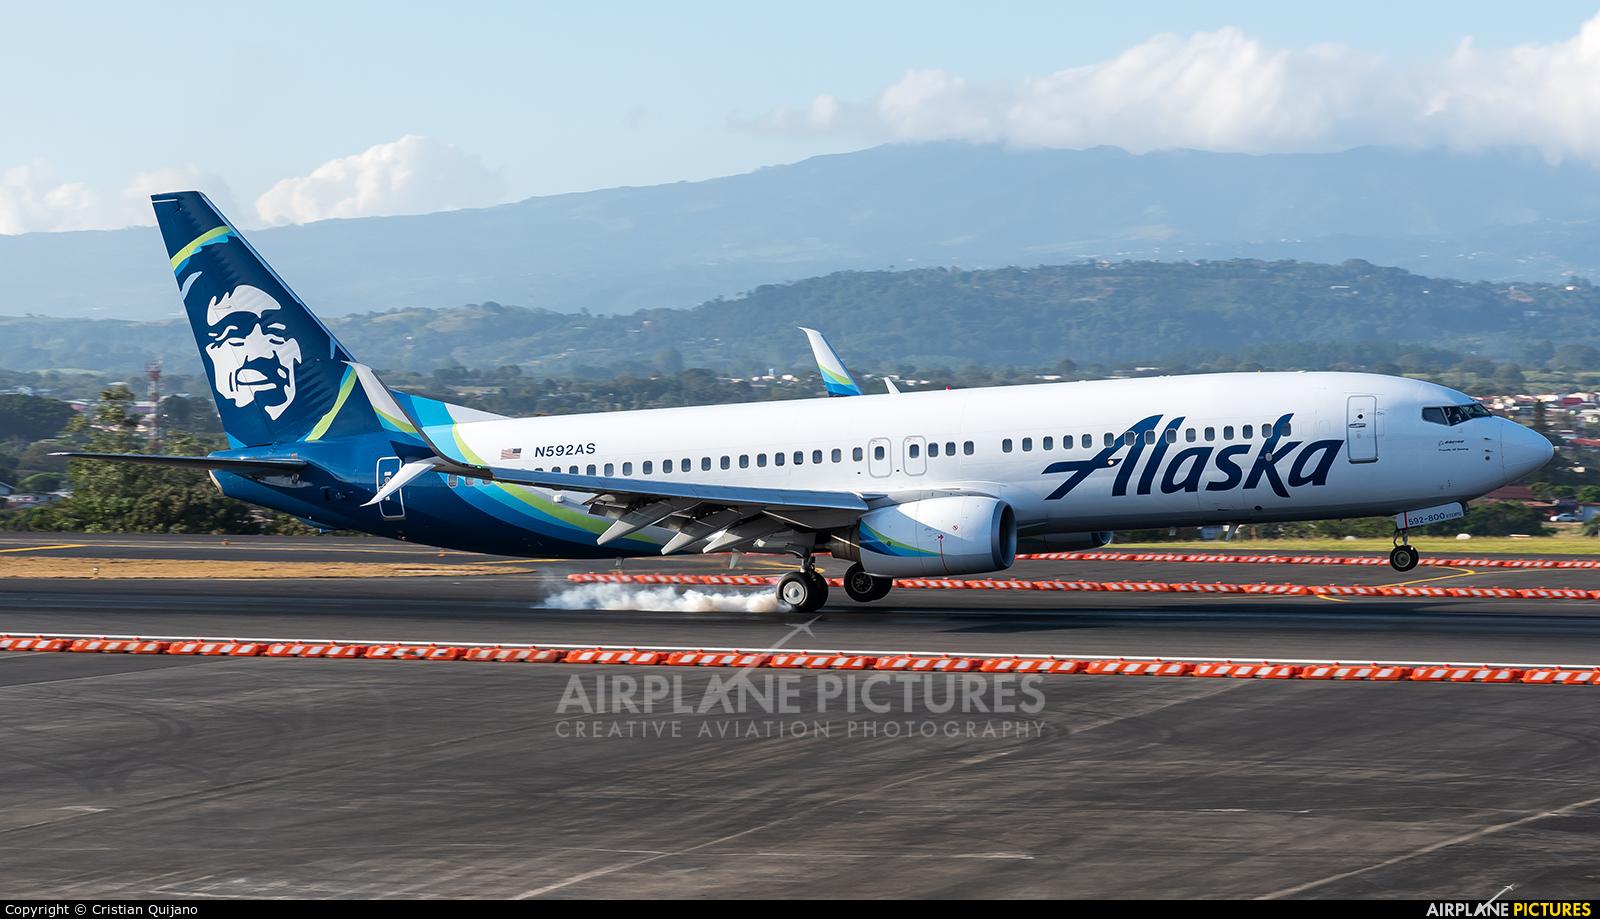 Alaska Airlines N592AS aircraft at San Jose - Juan Santamaría Intl